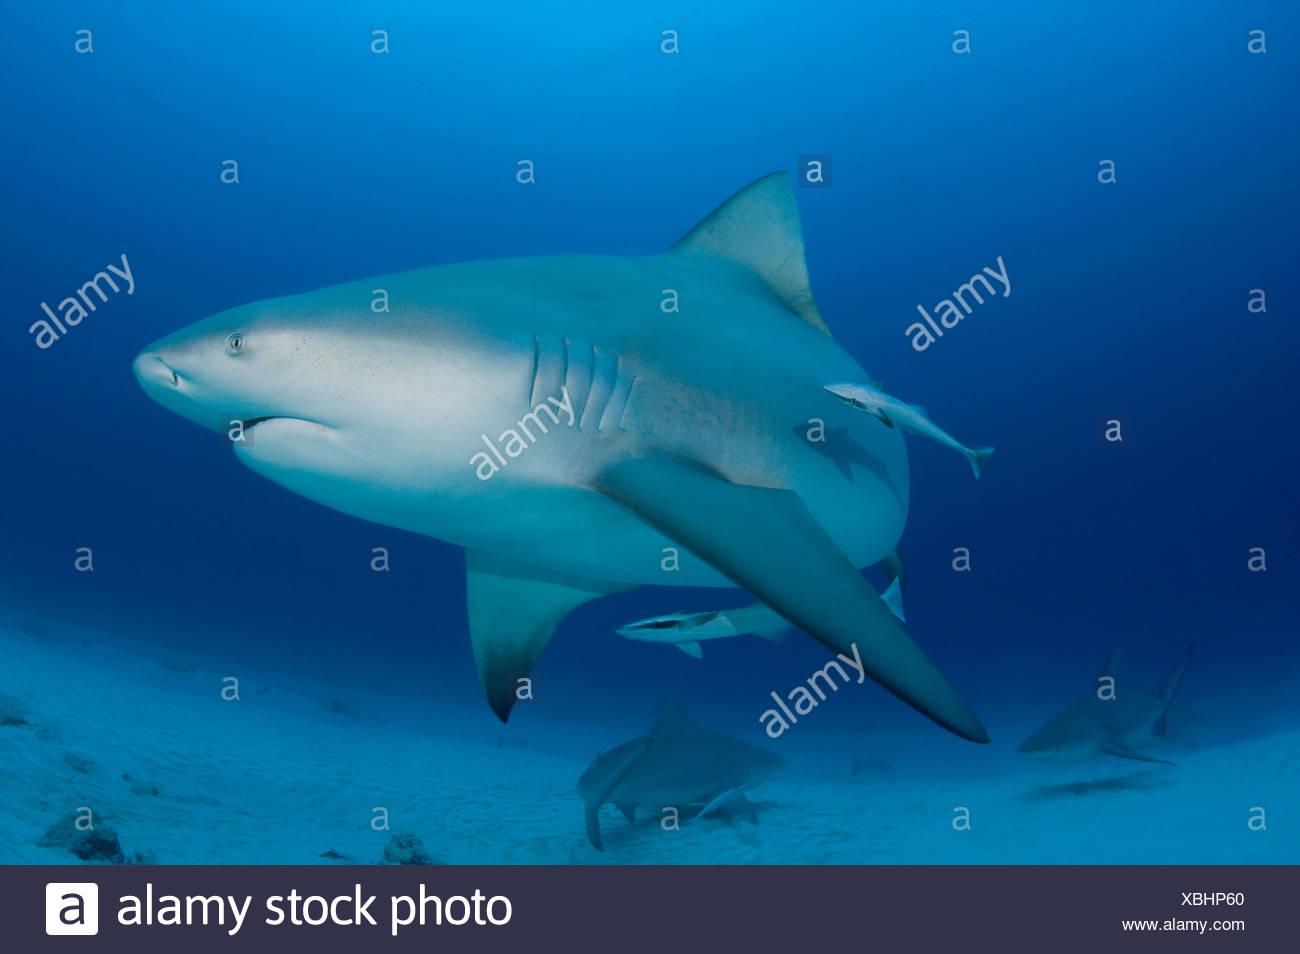 Female Bull sharks (Carcharhinus leucas) in seasonal breeding aggregation with Sharksuckers (Echeneis naucrates) Playa del Carmen, Cancun, Quintana Roo, Yucatan Peninsula, Mexico (Caribbean Sea) - Stock Image